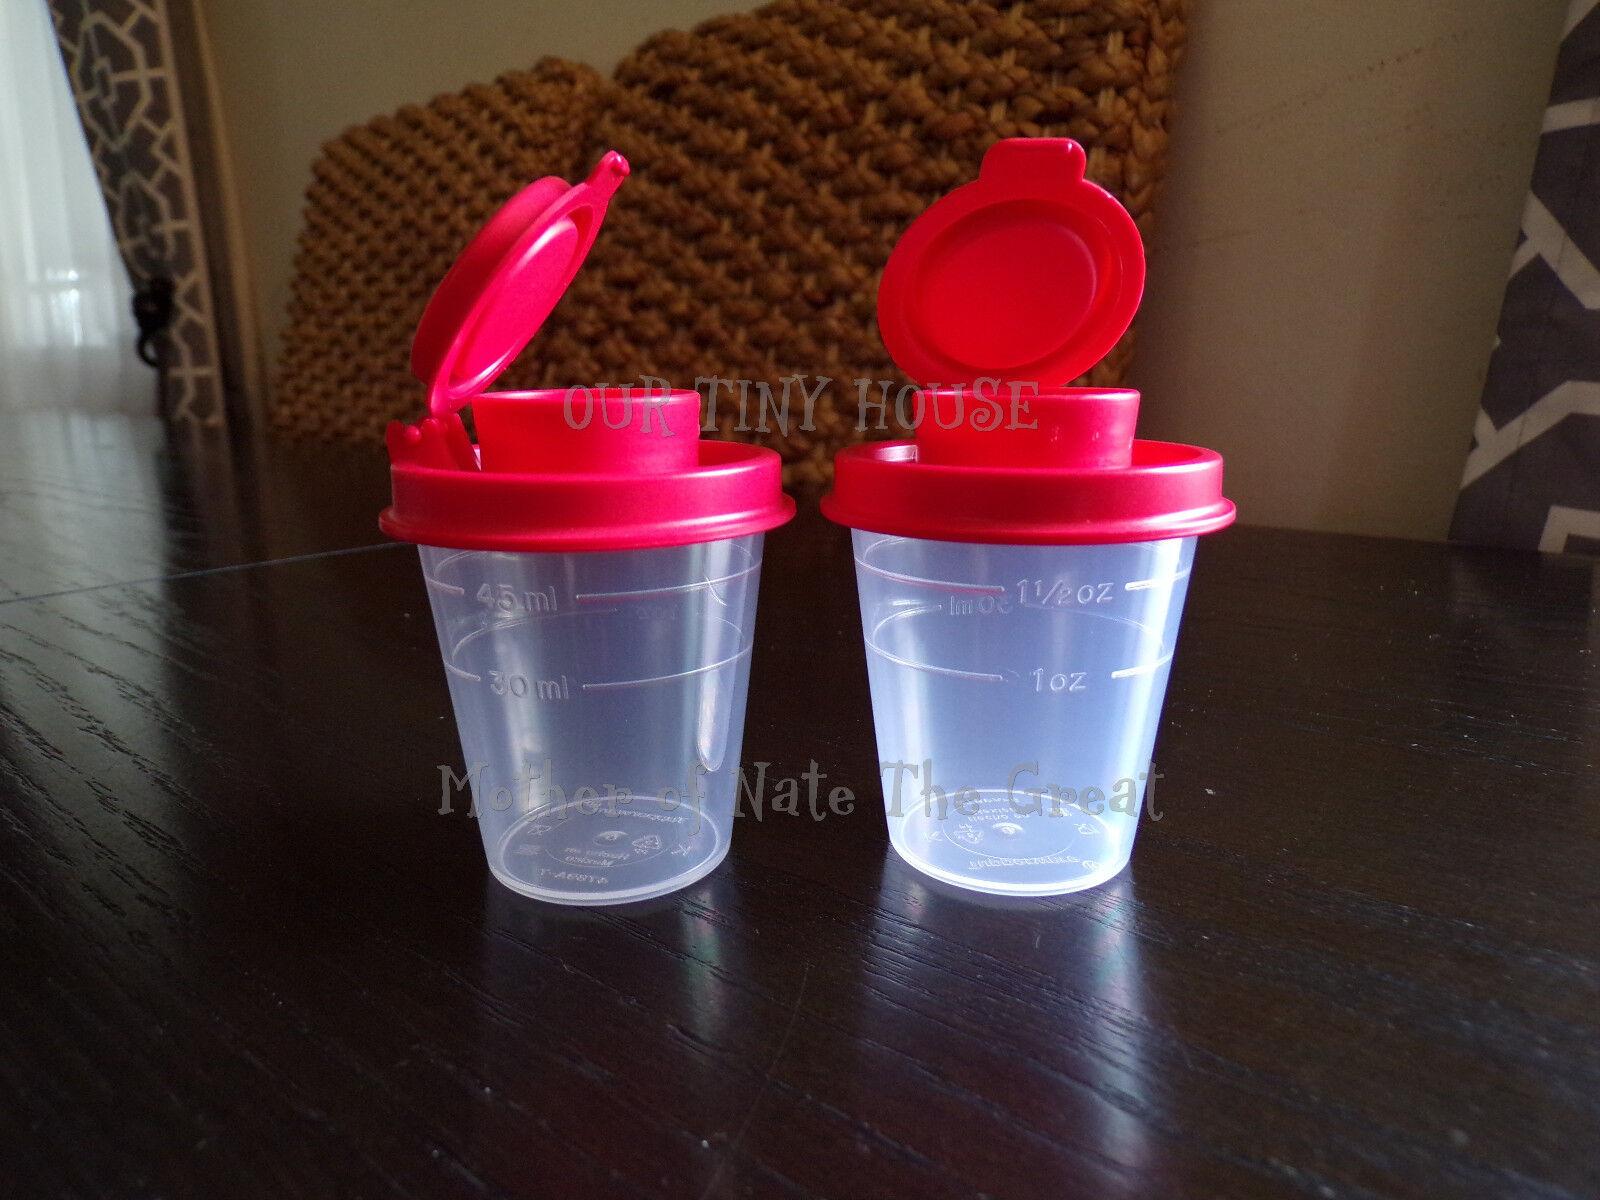 Изображение товара TUPPERWARE SALT AND PEPPER SHAKER SET Spice Small Midget Mini Travel S&P RED